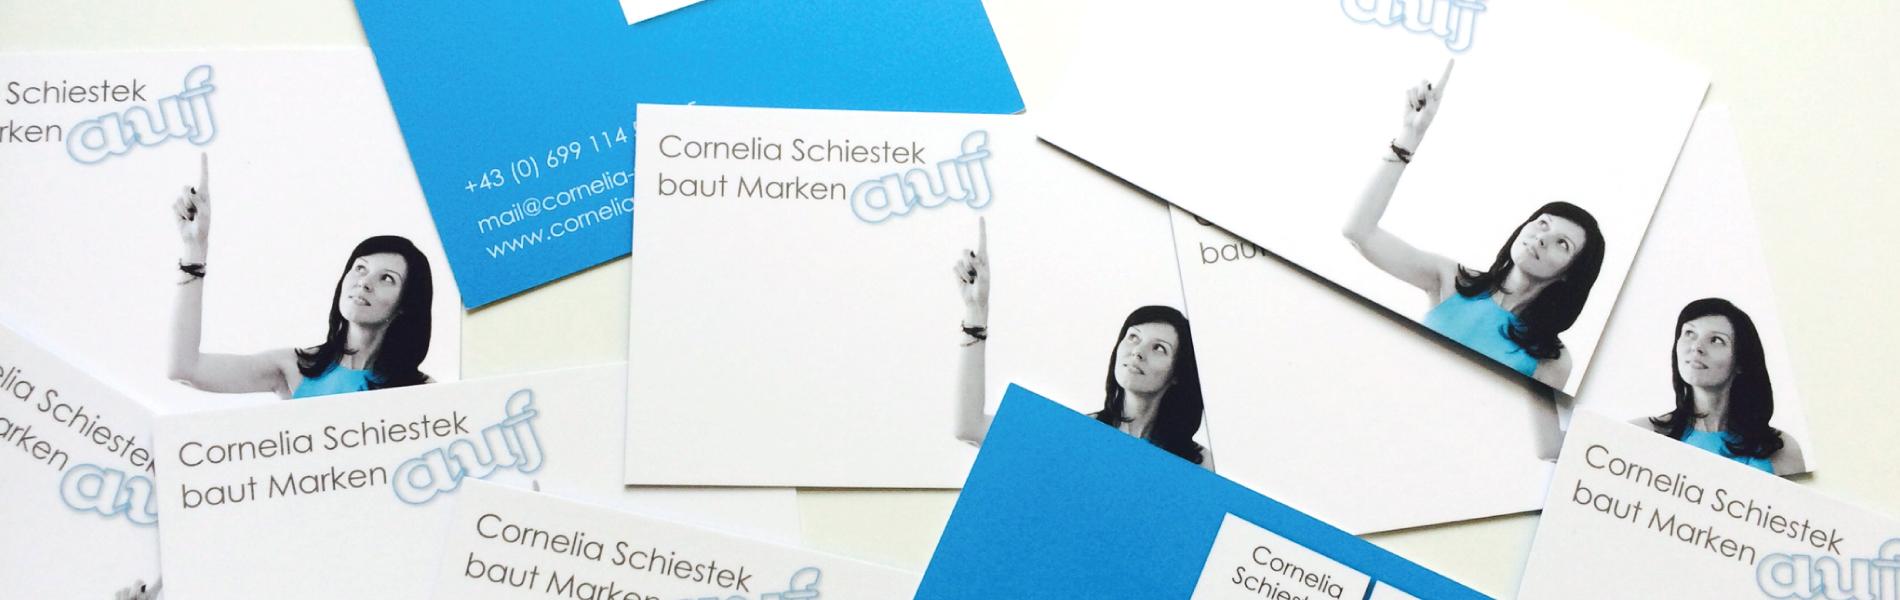 Kontakt Cornelia Schiestek